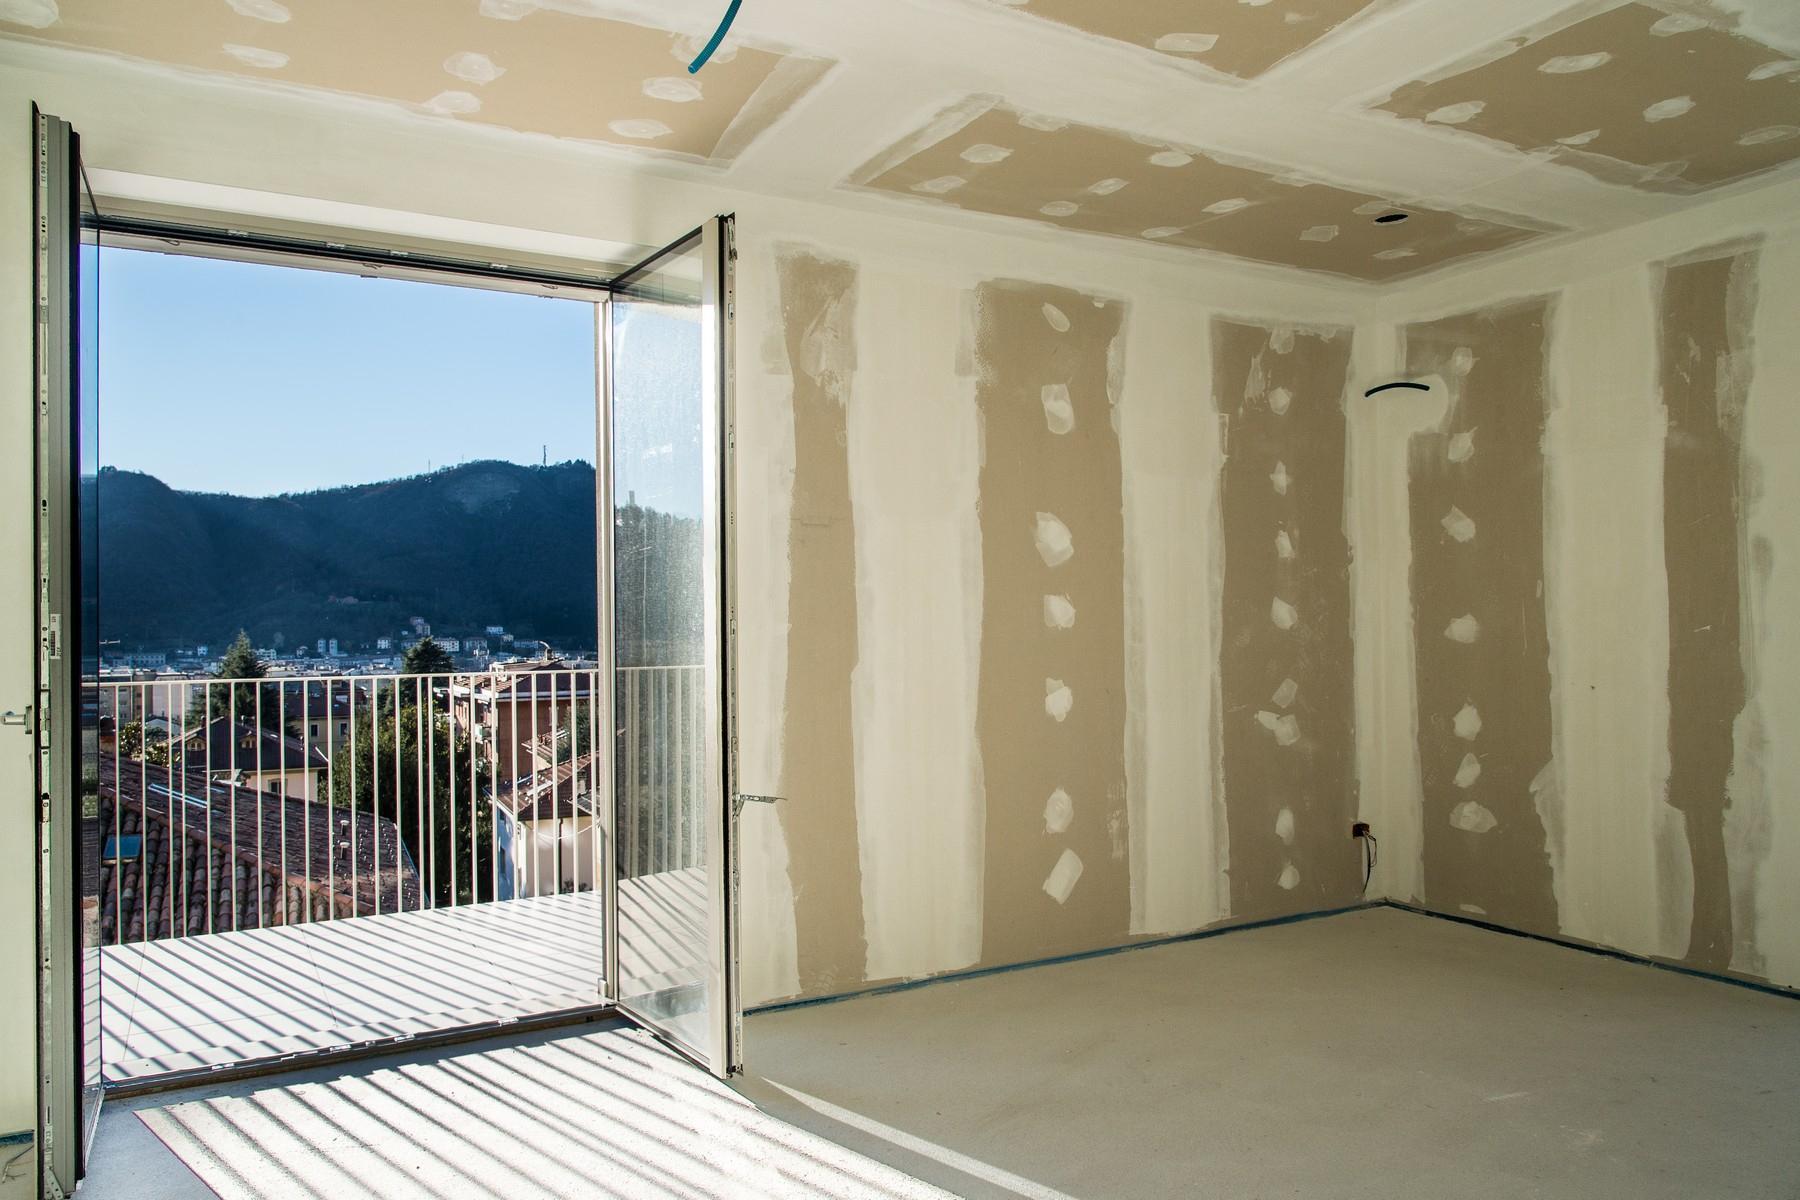 Exclusif appartement neuf en position panoramique - 15